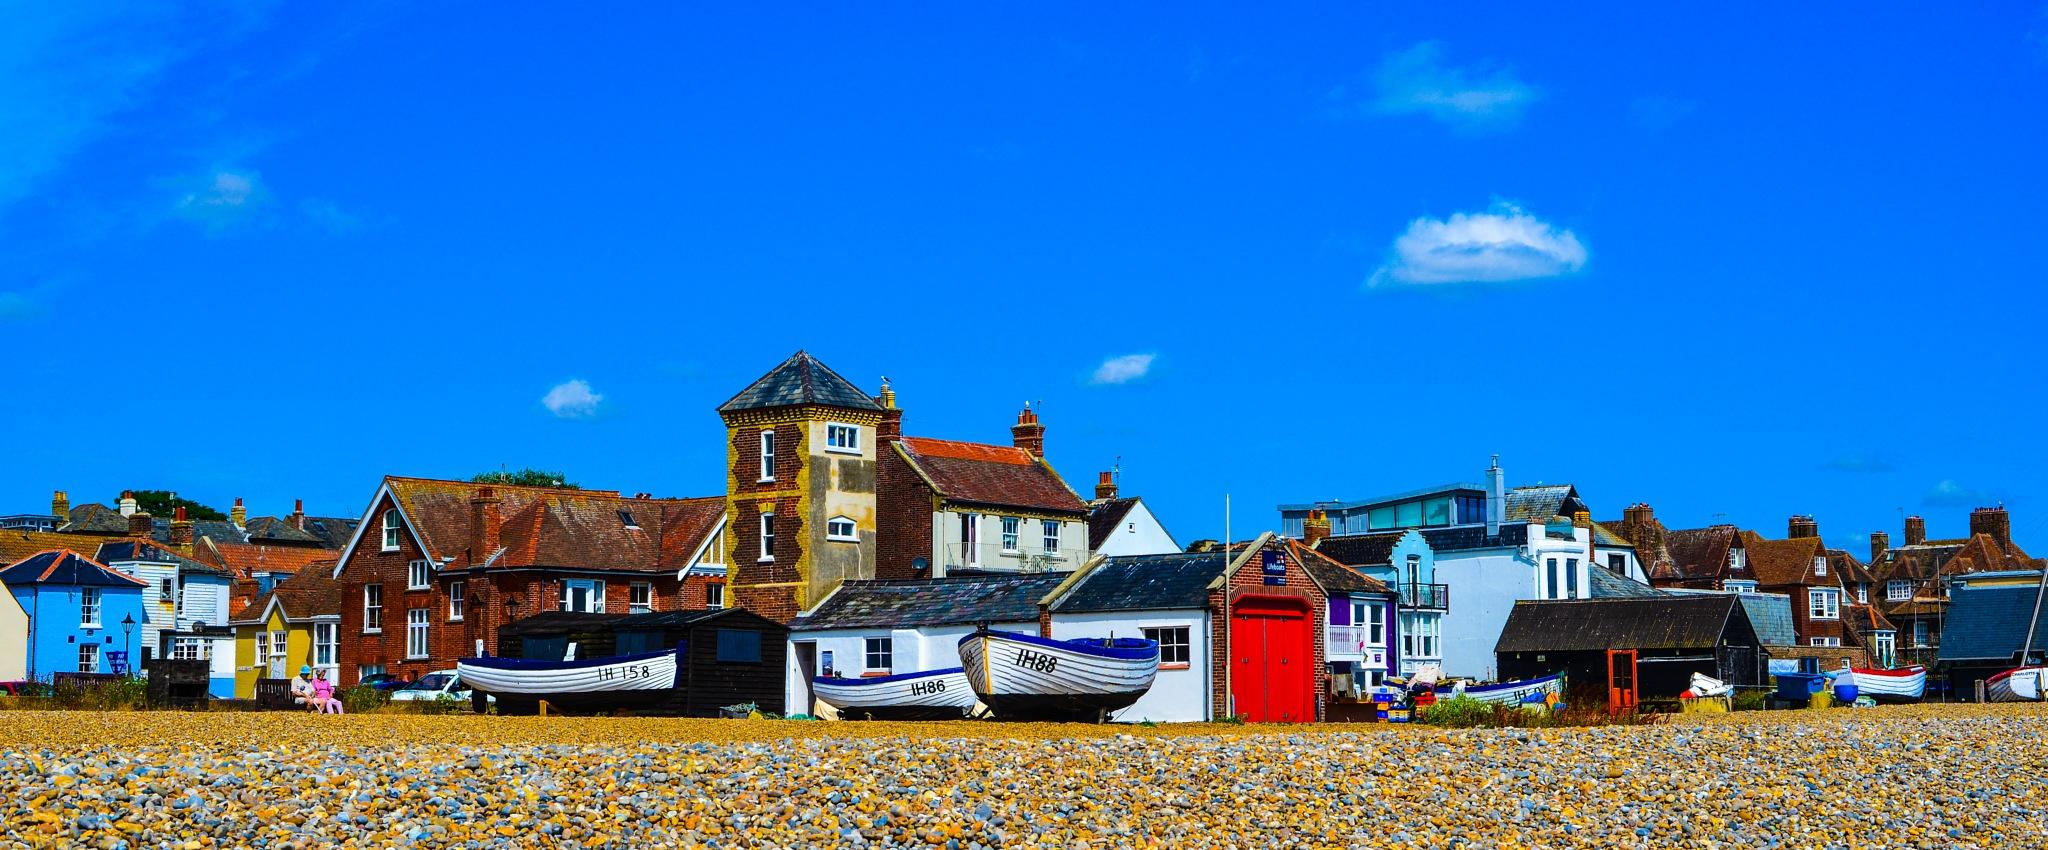 Aldeburgh beach by SteveSmith02